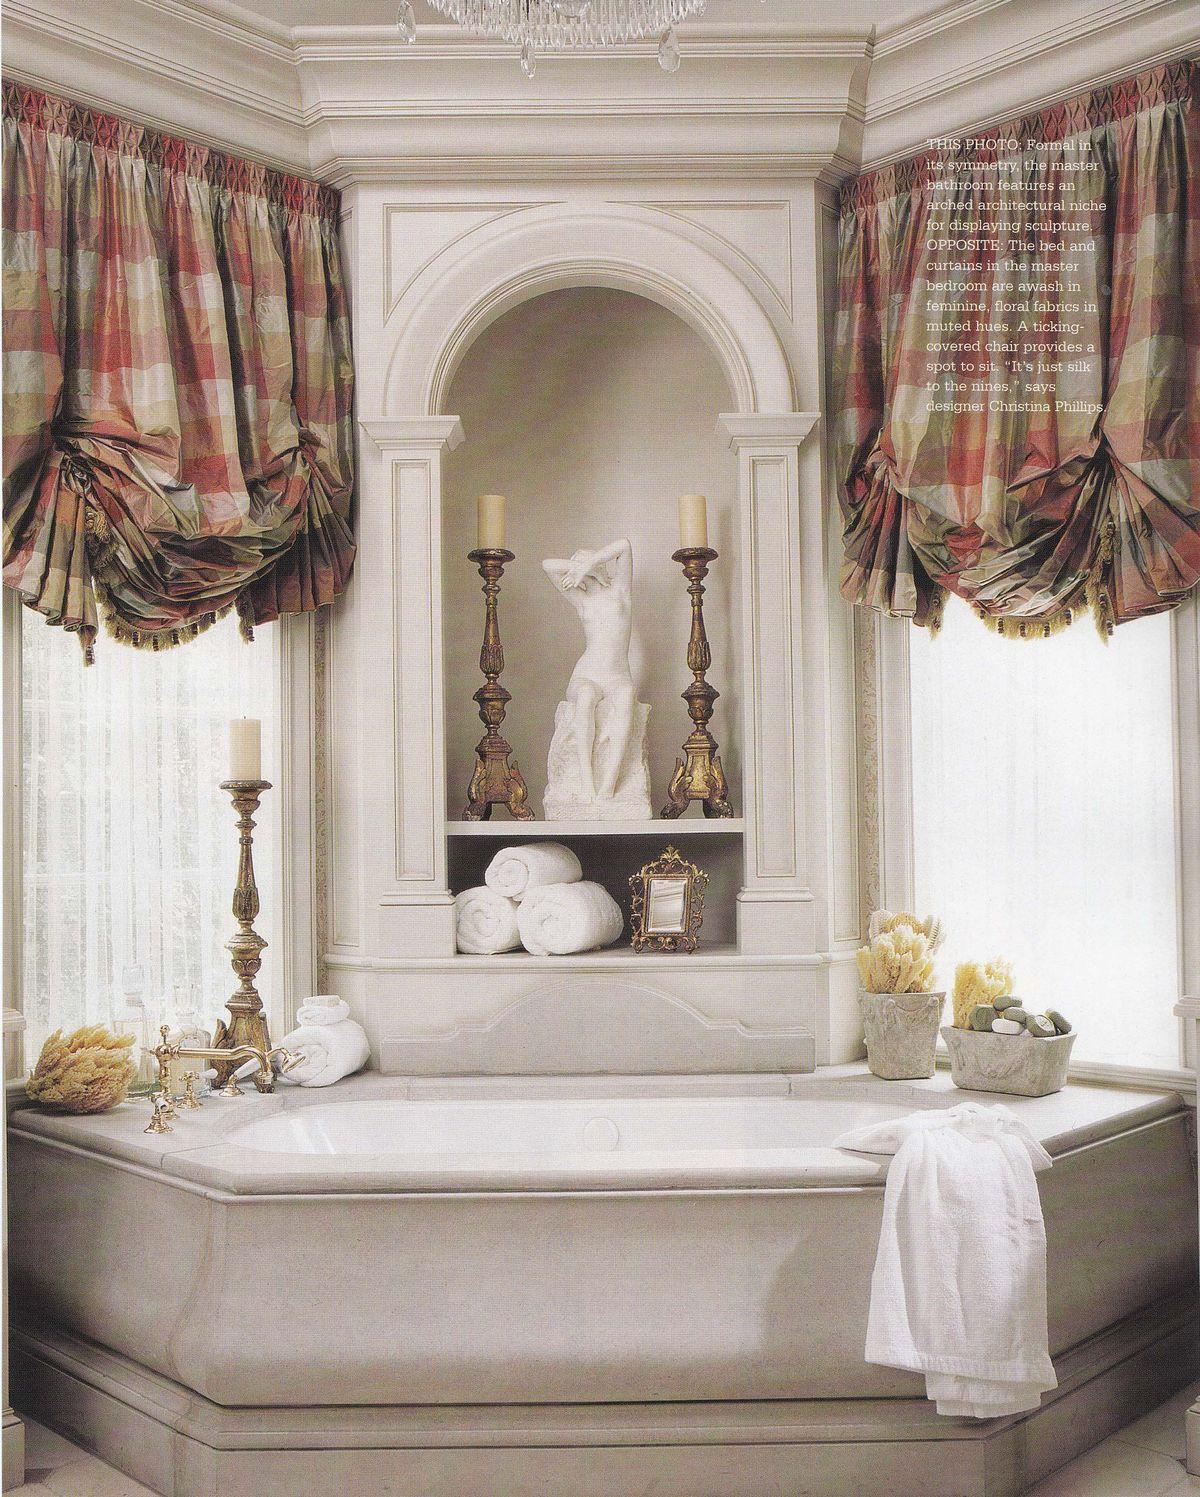 Beautiful bath tub and gorgeous window treatments